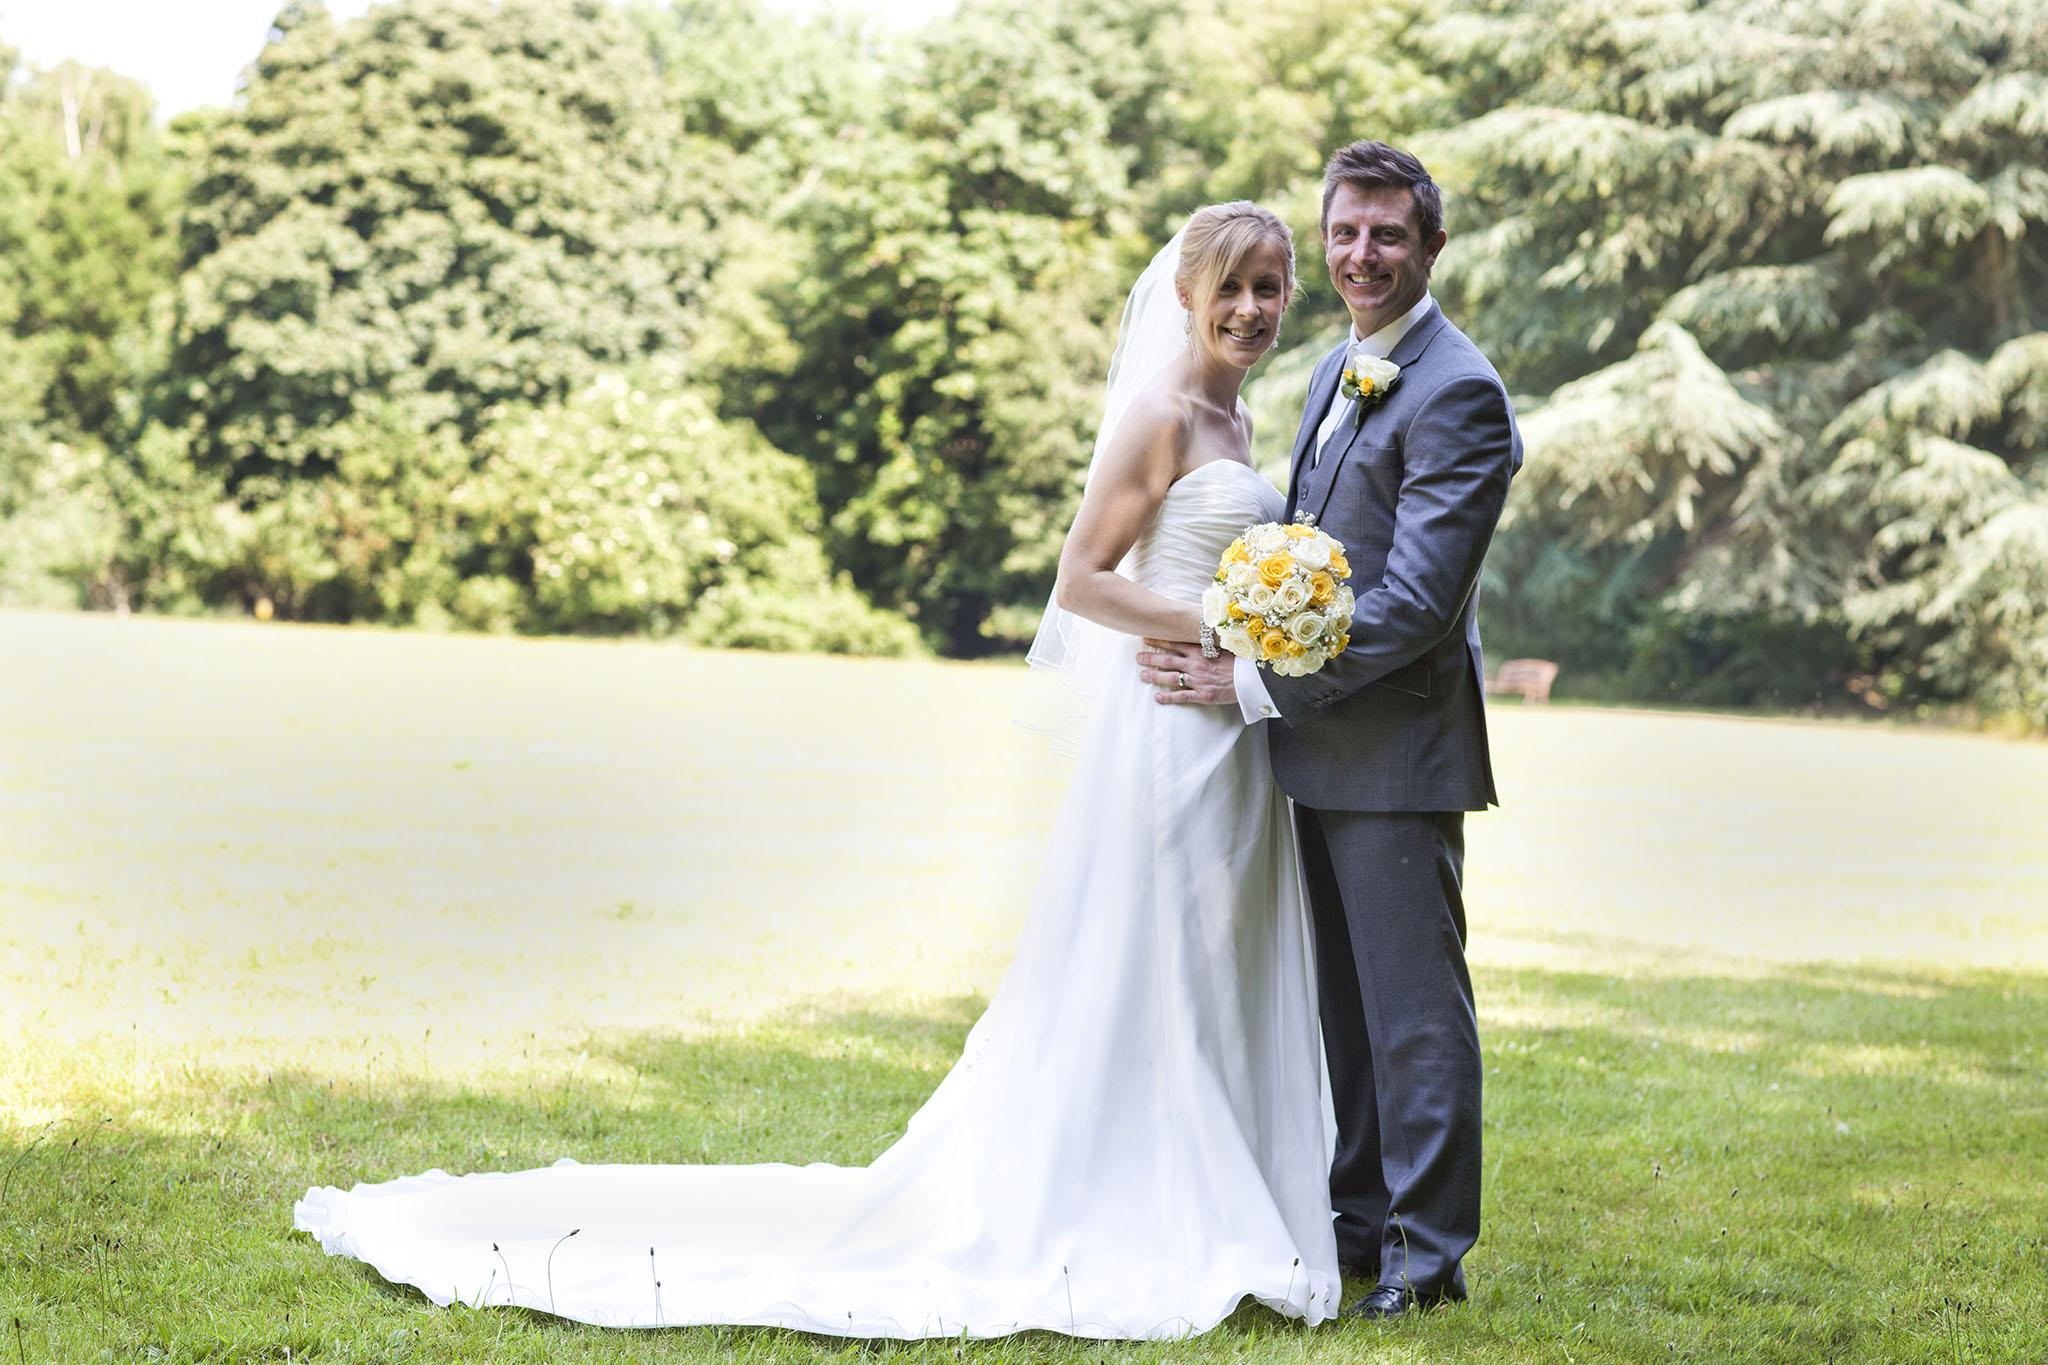 elizabethg_fineart_photography_hertfordshire_rachel_adam_wedding_highelmsmanor_30.jpg